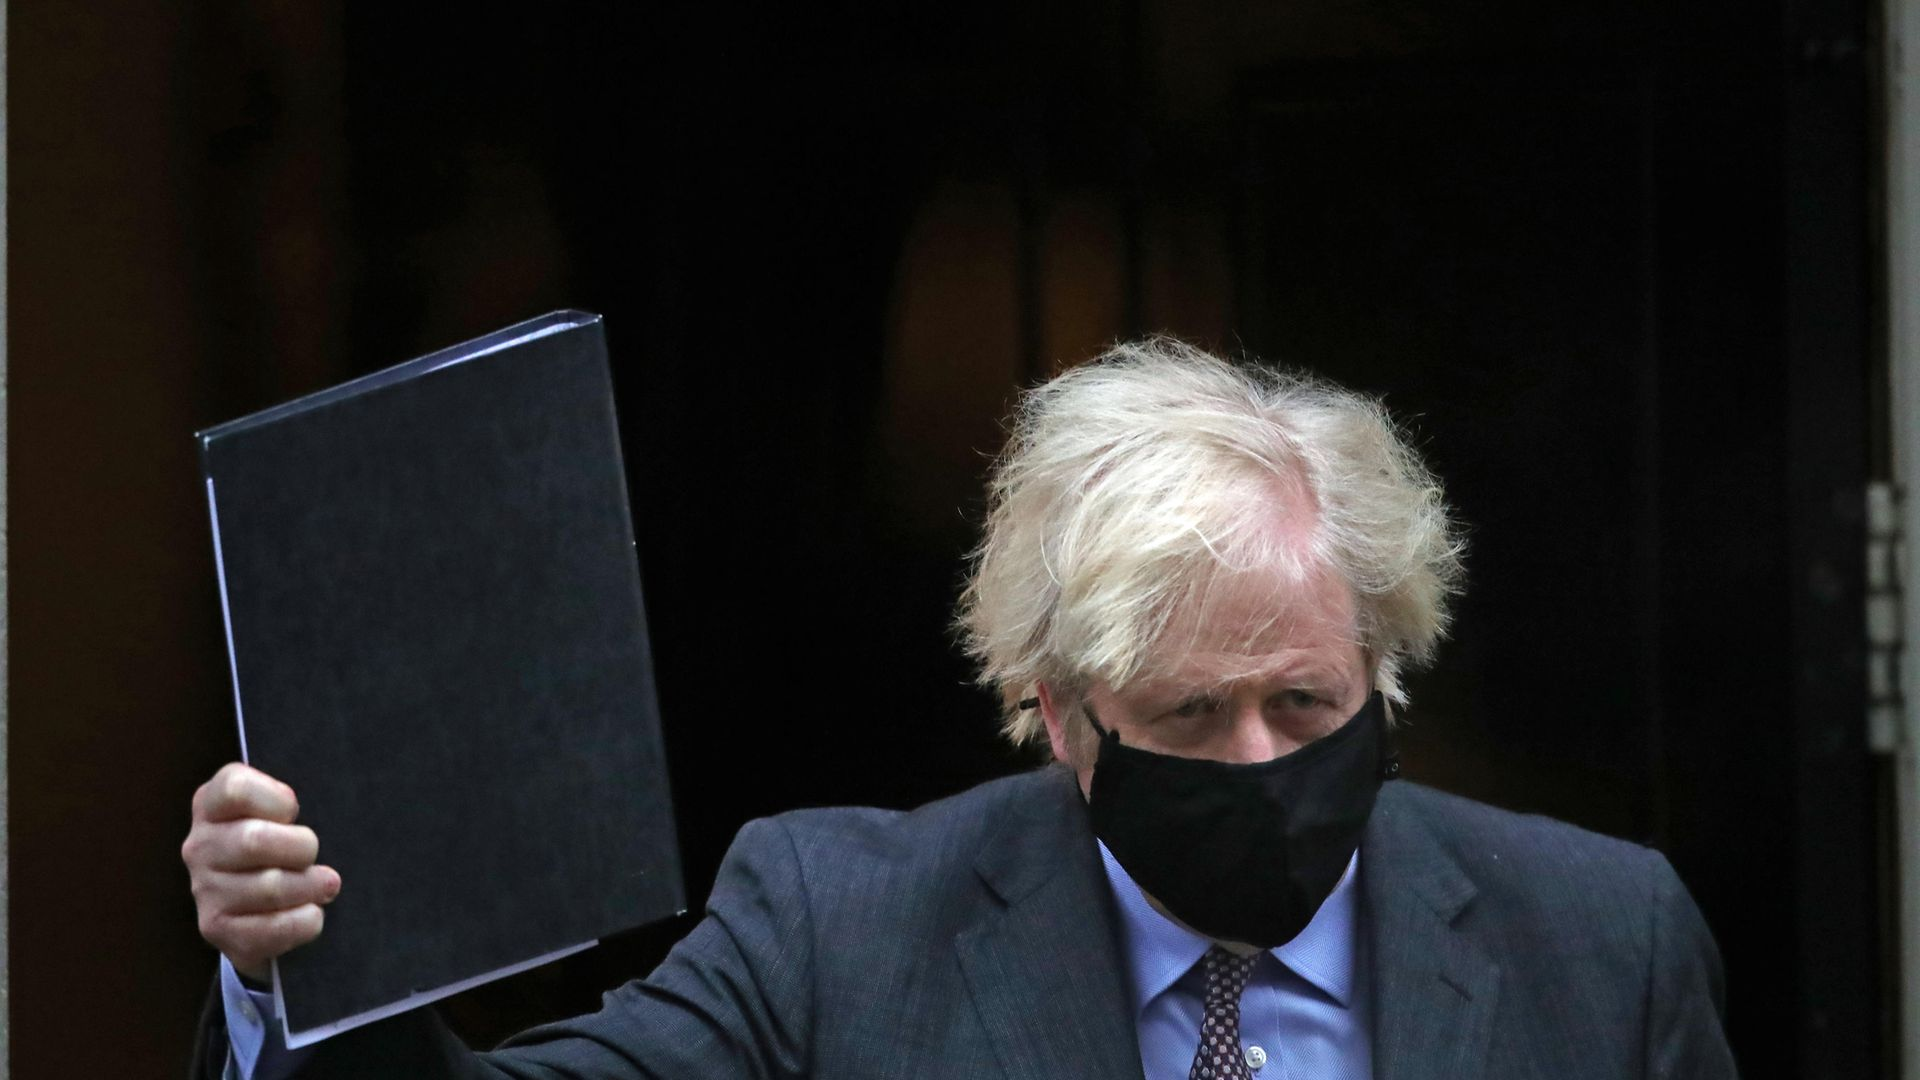 Prime minister Boris Johnson leaving 10 Downing Street - Credit: PA